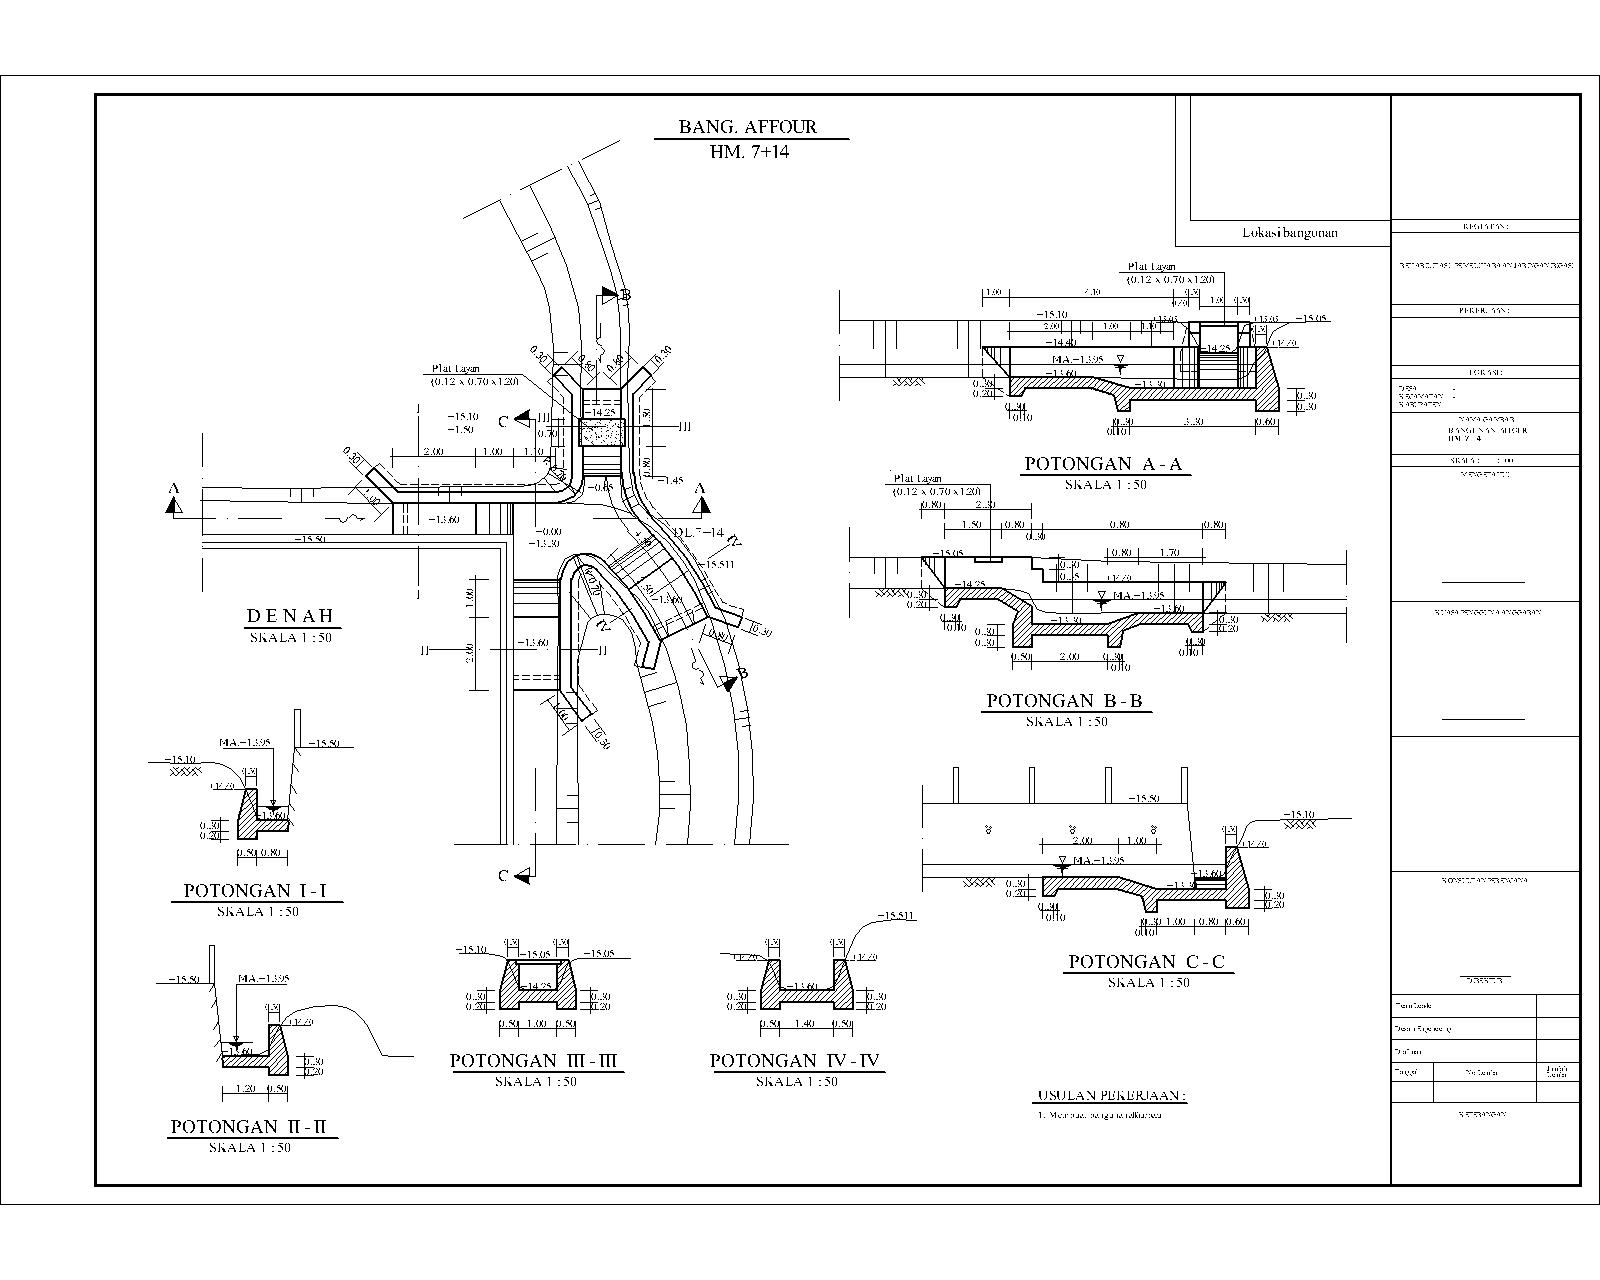 Kumpulan Gambar Sketsa Tanggul Utama Primer